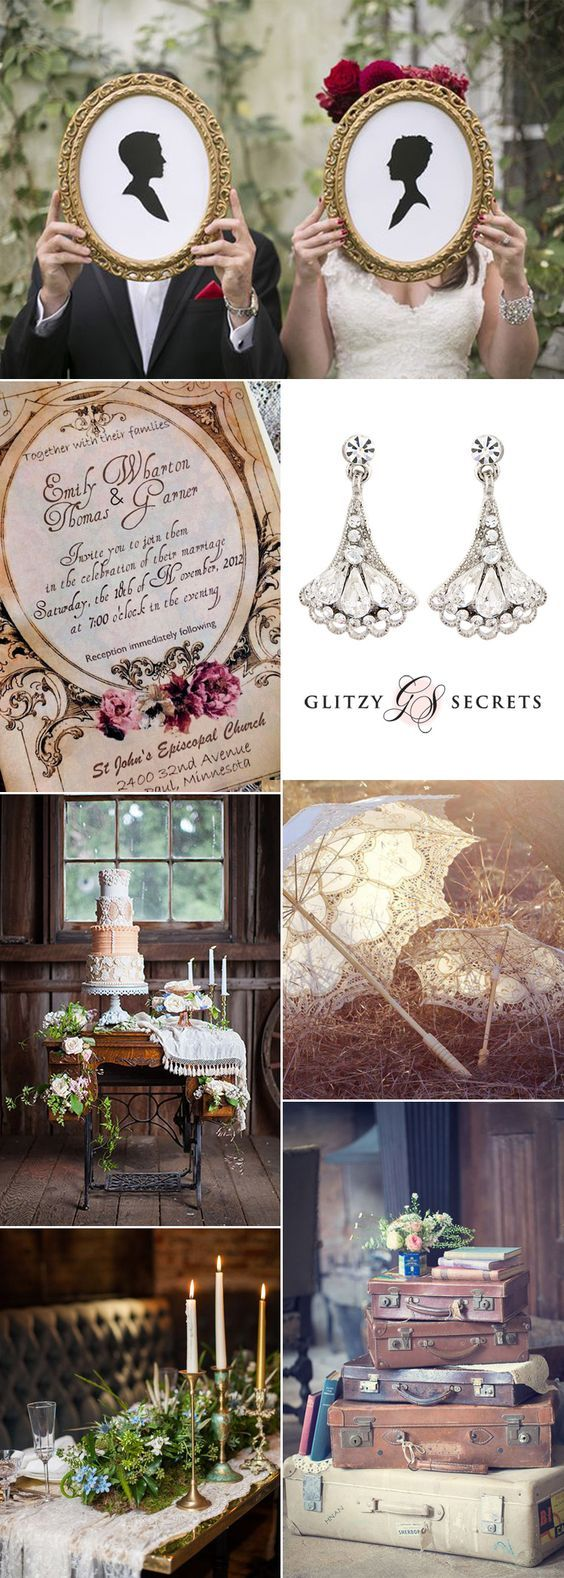 Wedding decorations lavender september 2018 Classic Vintage Wedding Theme Ideas in   Wedding ideas